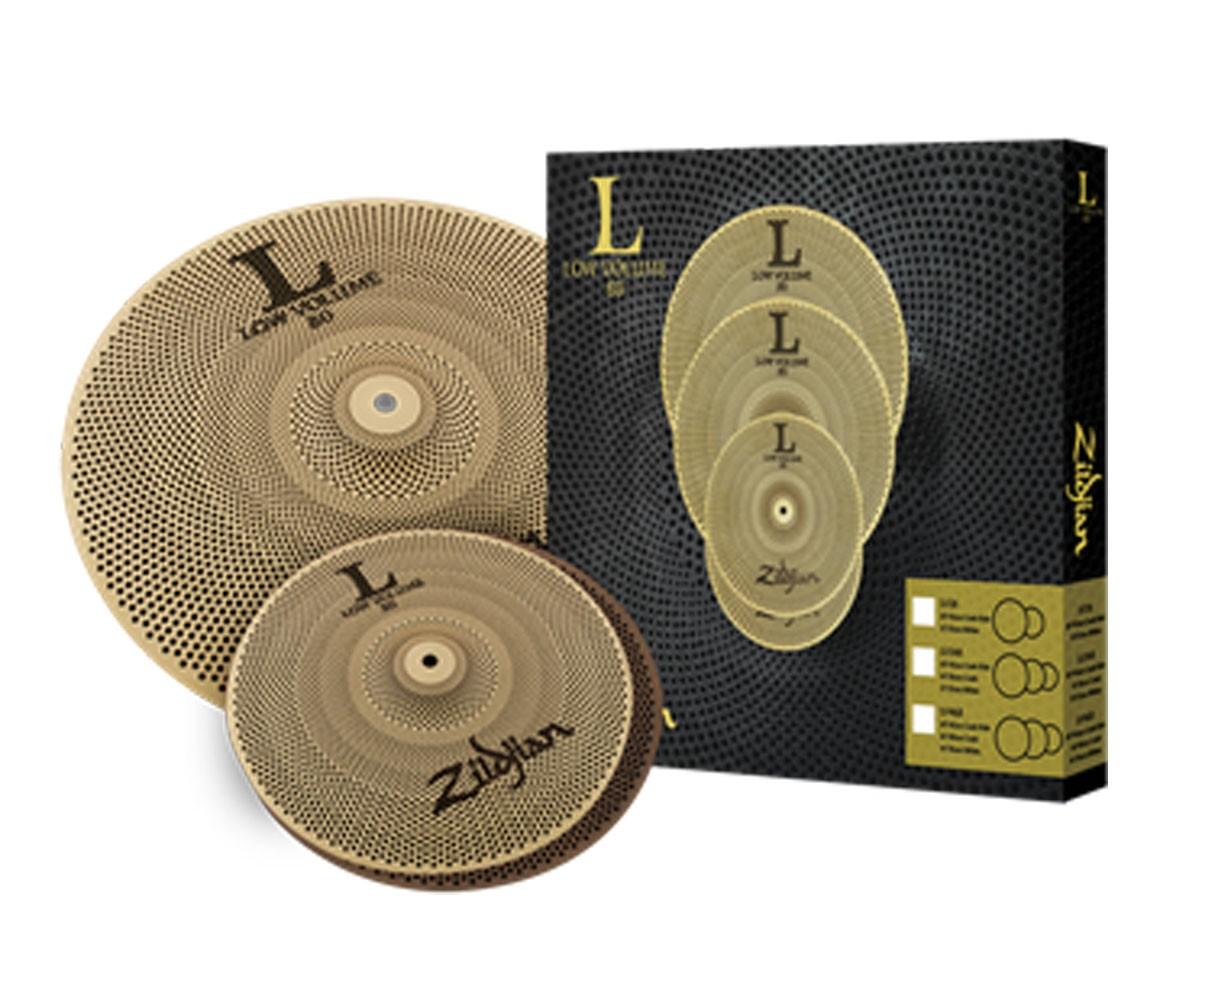 Zildjian L80 Low Volume 38 Cymbal Box Set